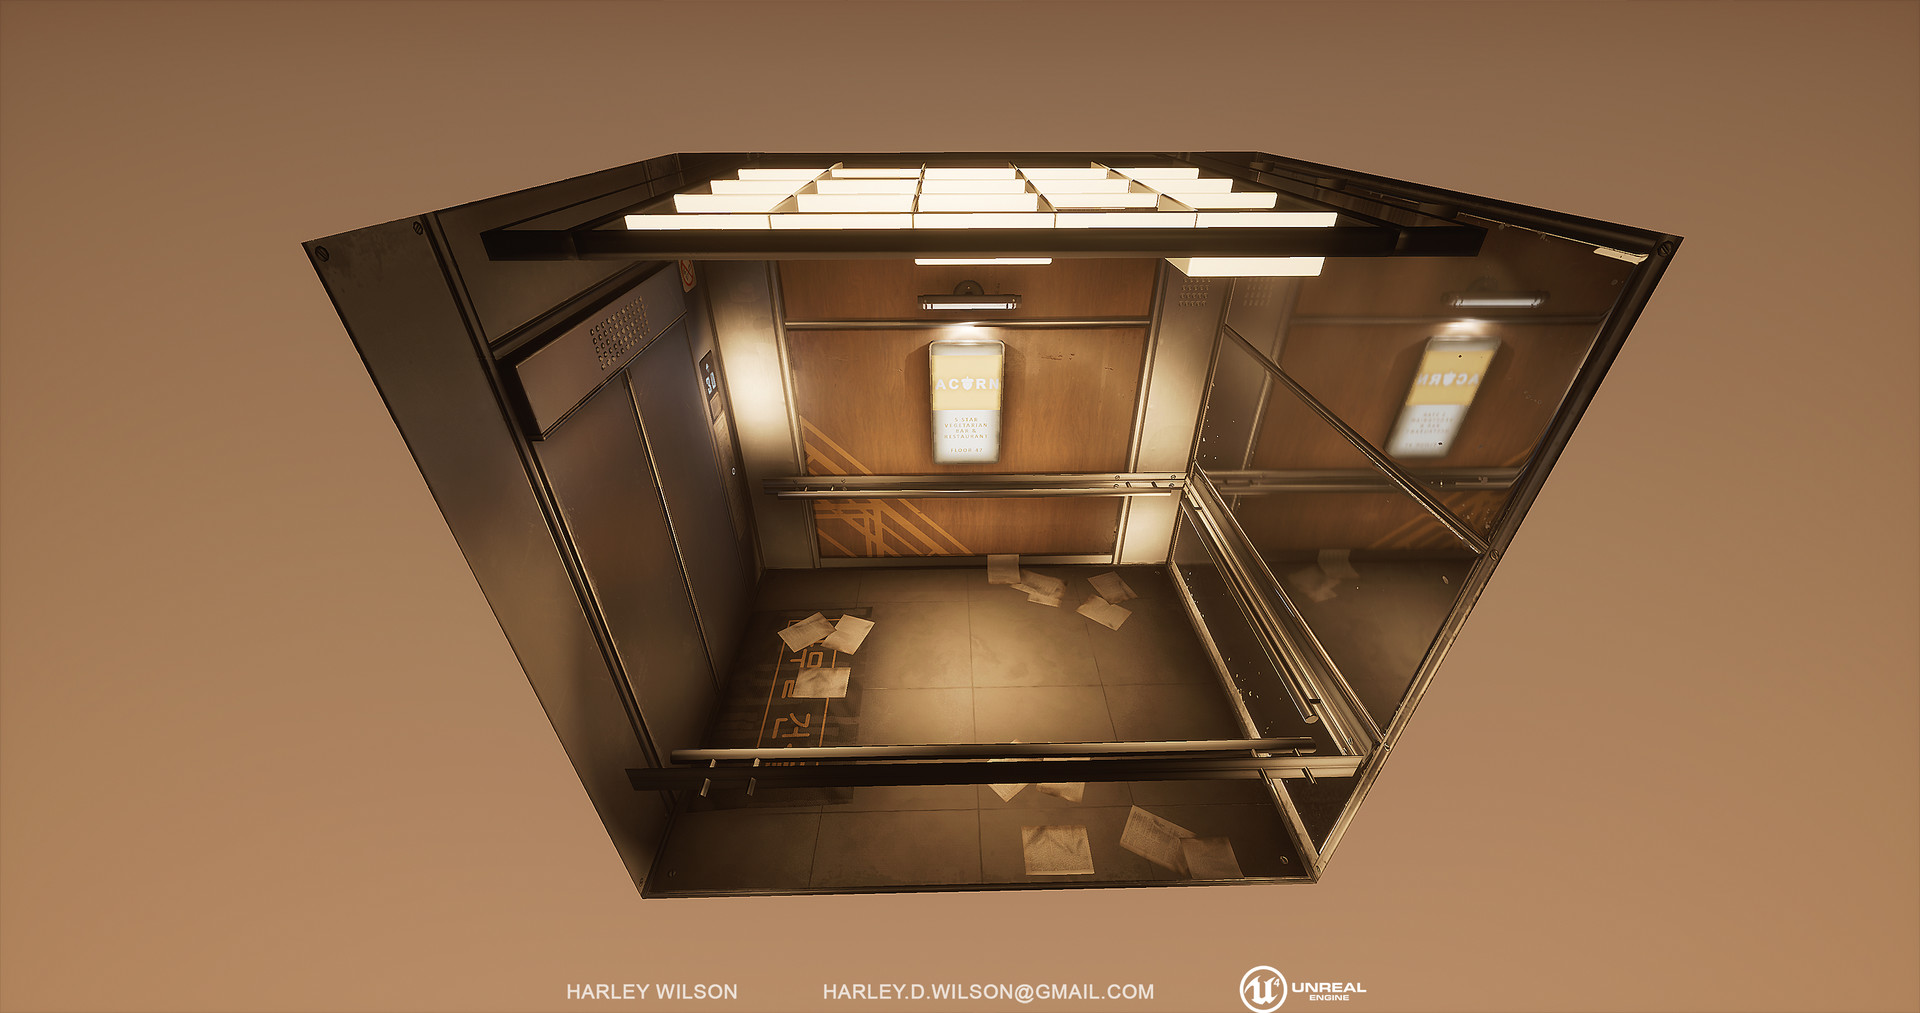 Harley wilson elevator techa